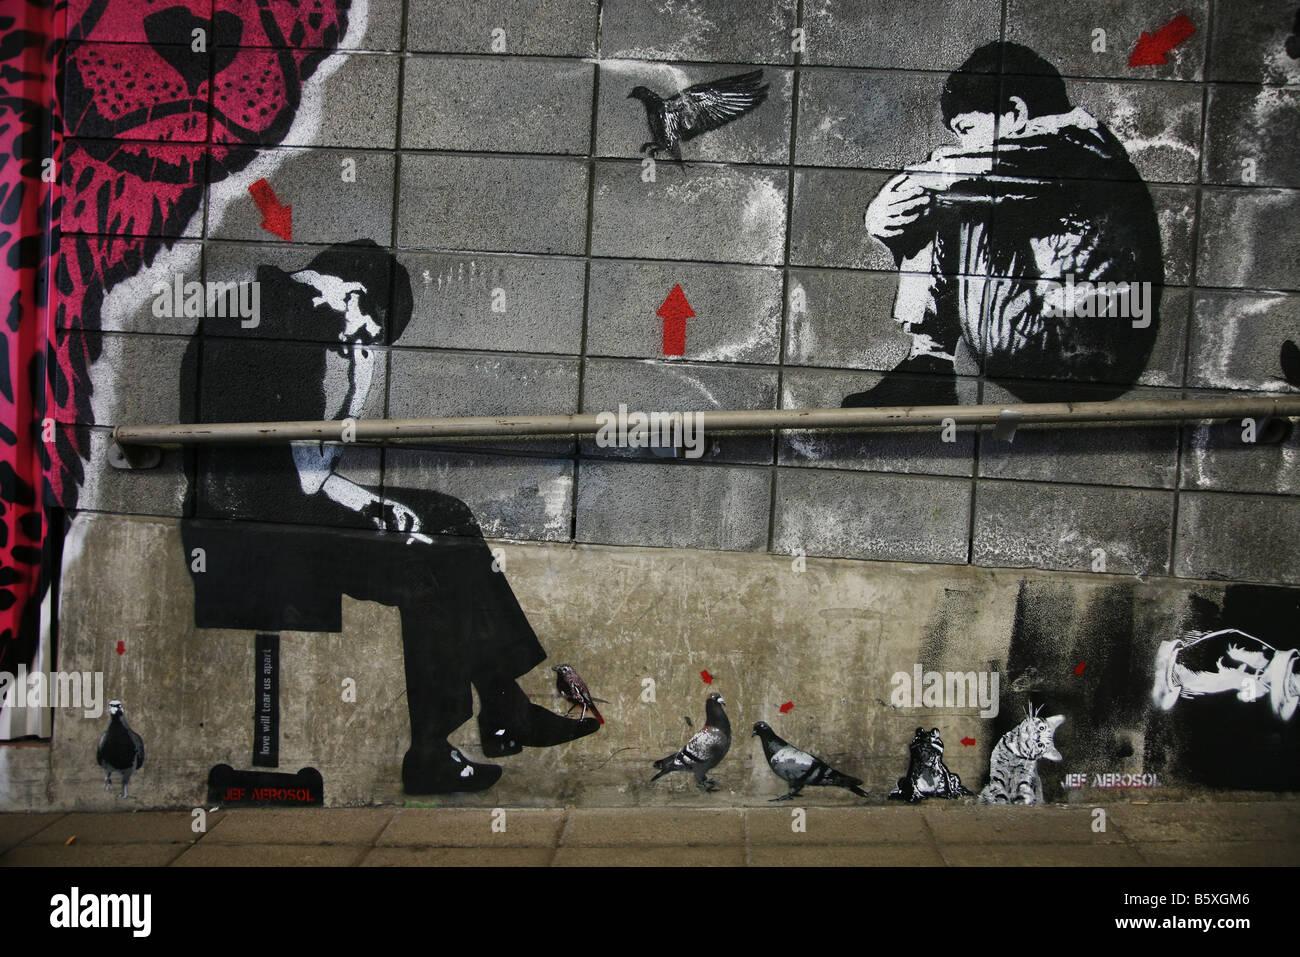 Depressed Sad Homeless Banksy Graffiti Artist Art Exhibition